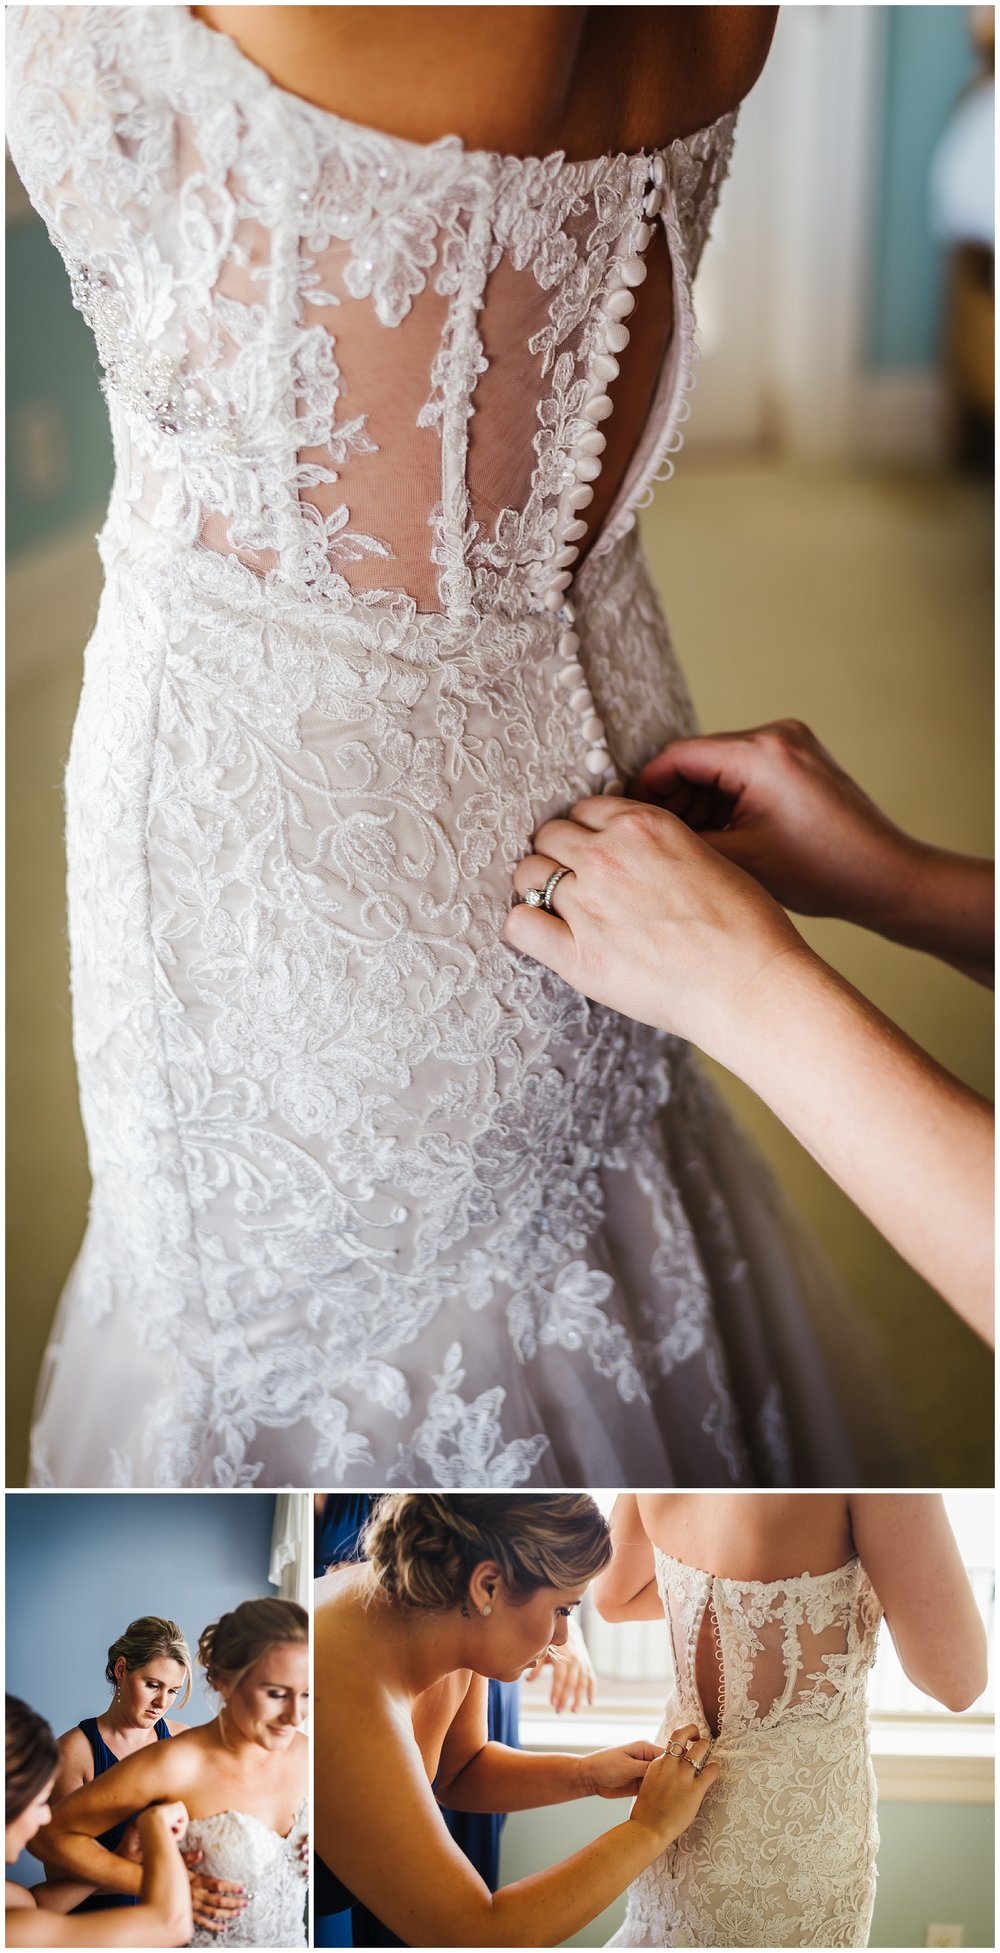 Tampa-wedding-photographer-bella-fleur-orchid-boquet-rsvb-events_0002.jpg